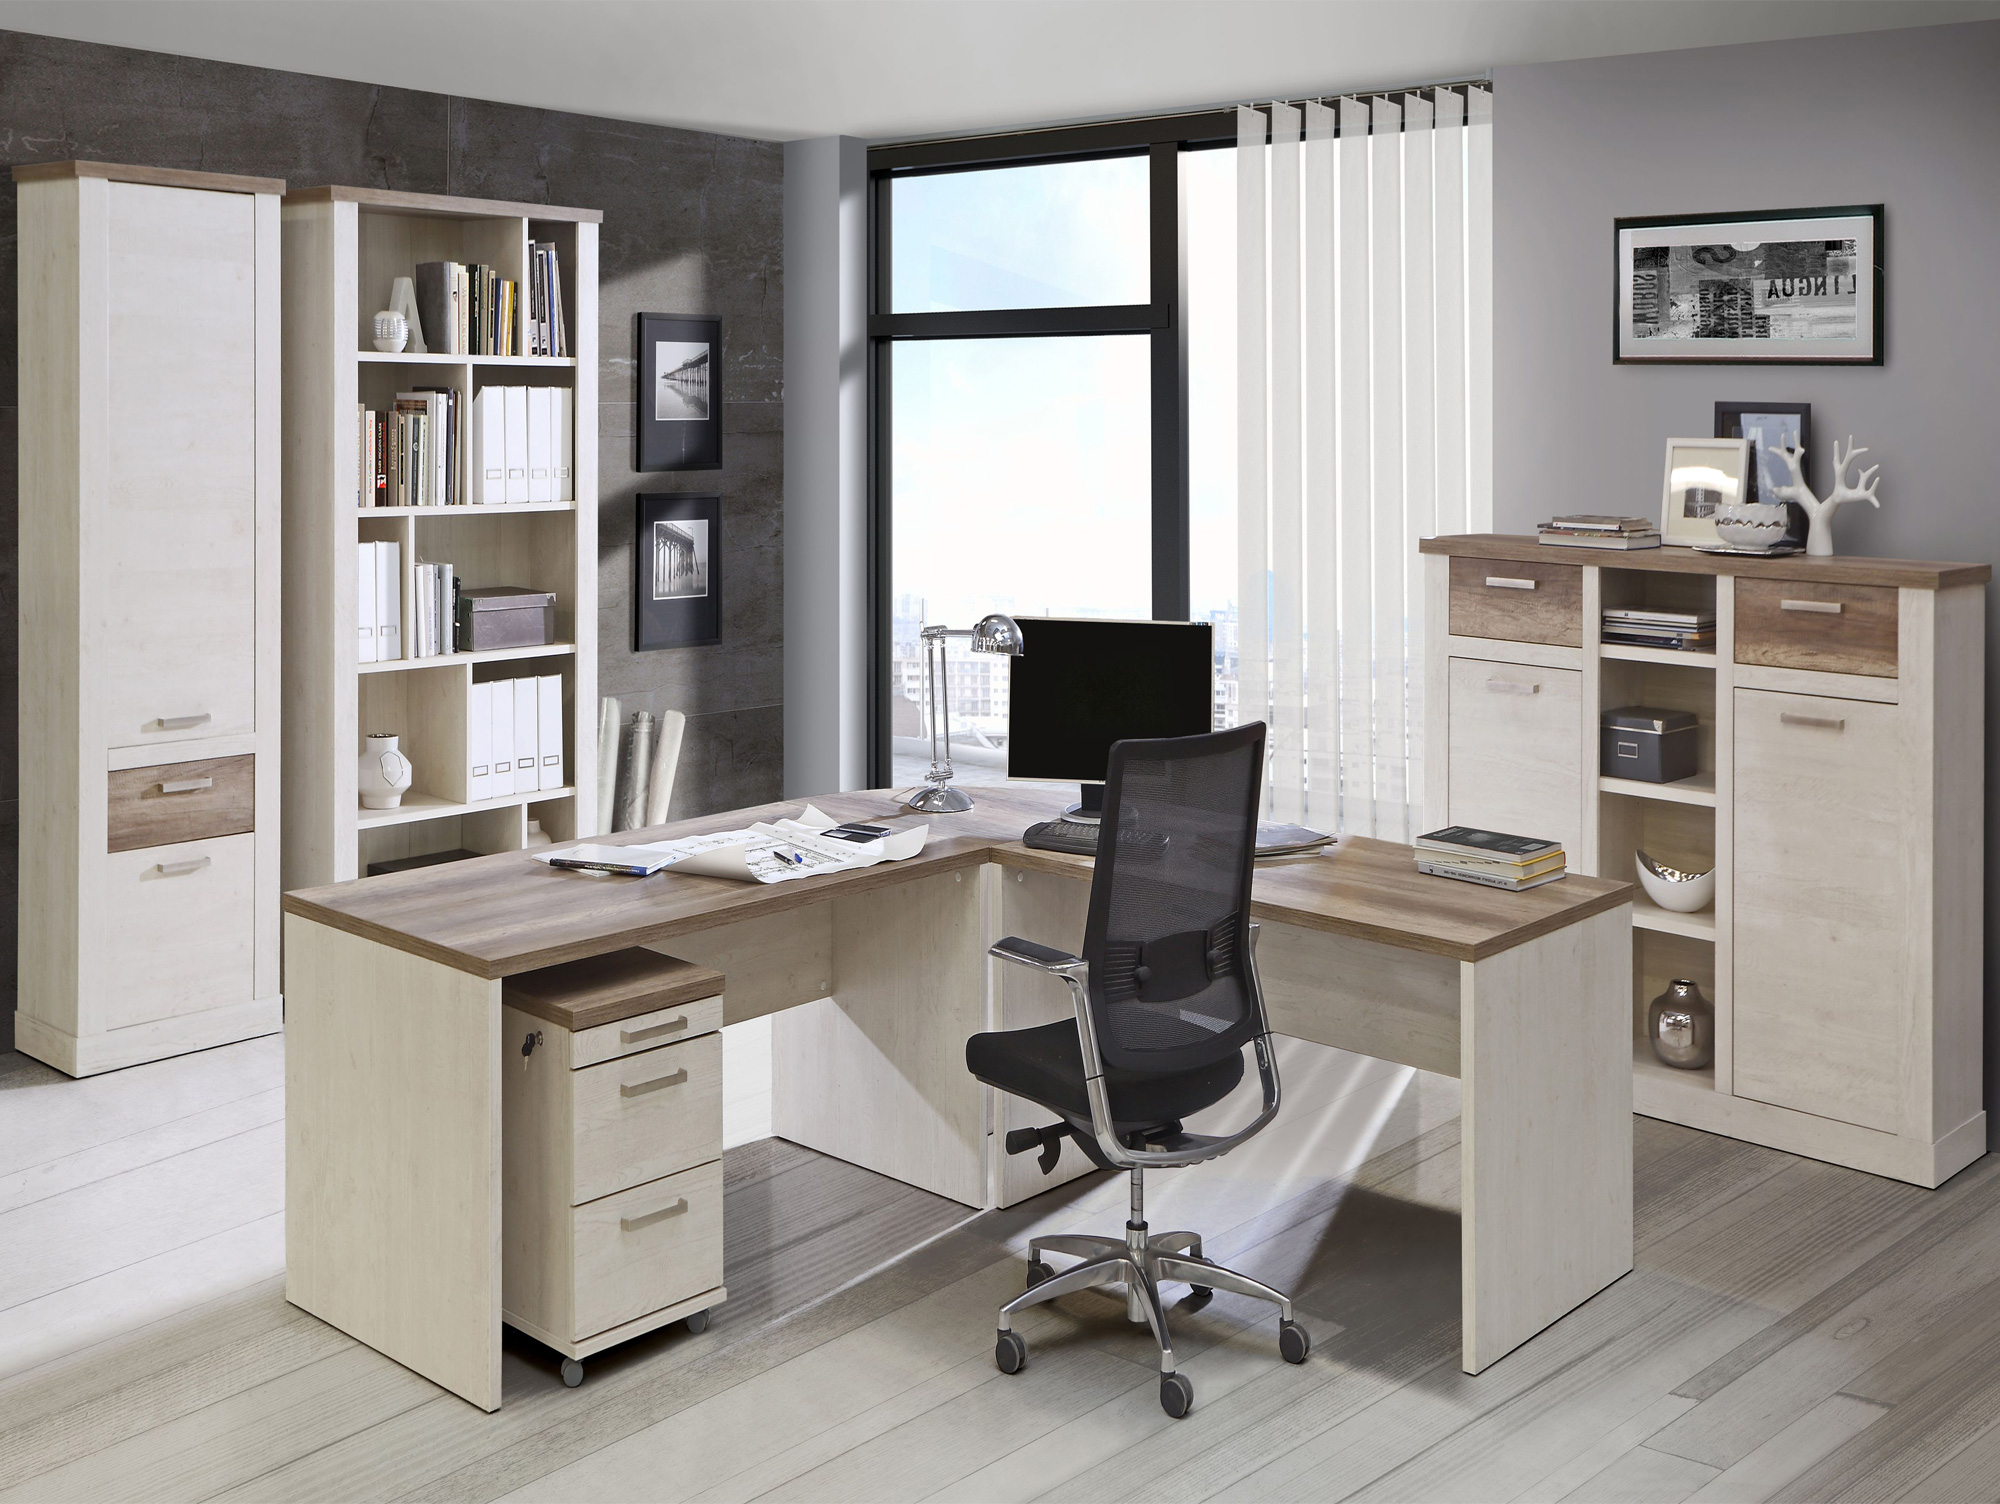 dagur regal gro pinie wei eiche antik. Black Bedroom Furniture Sets. Home Design Ideas